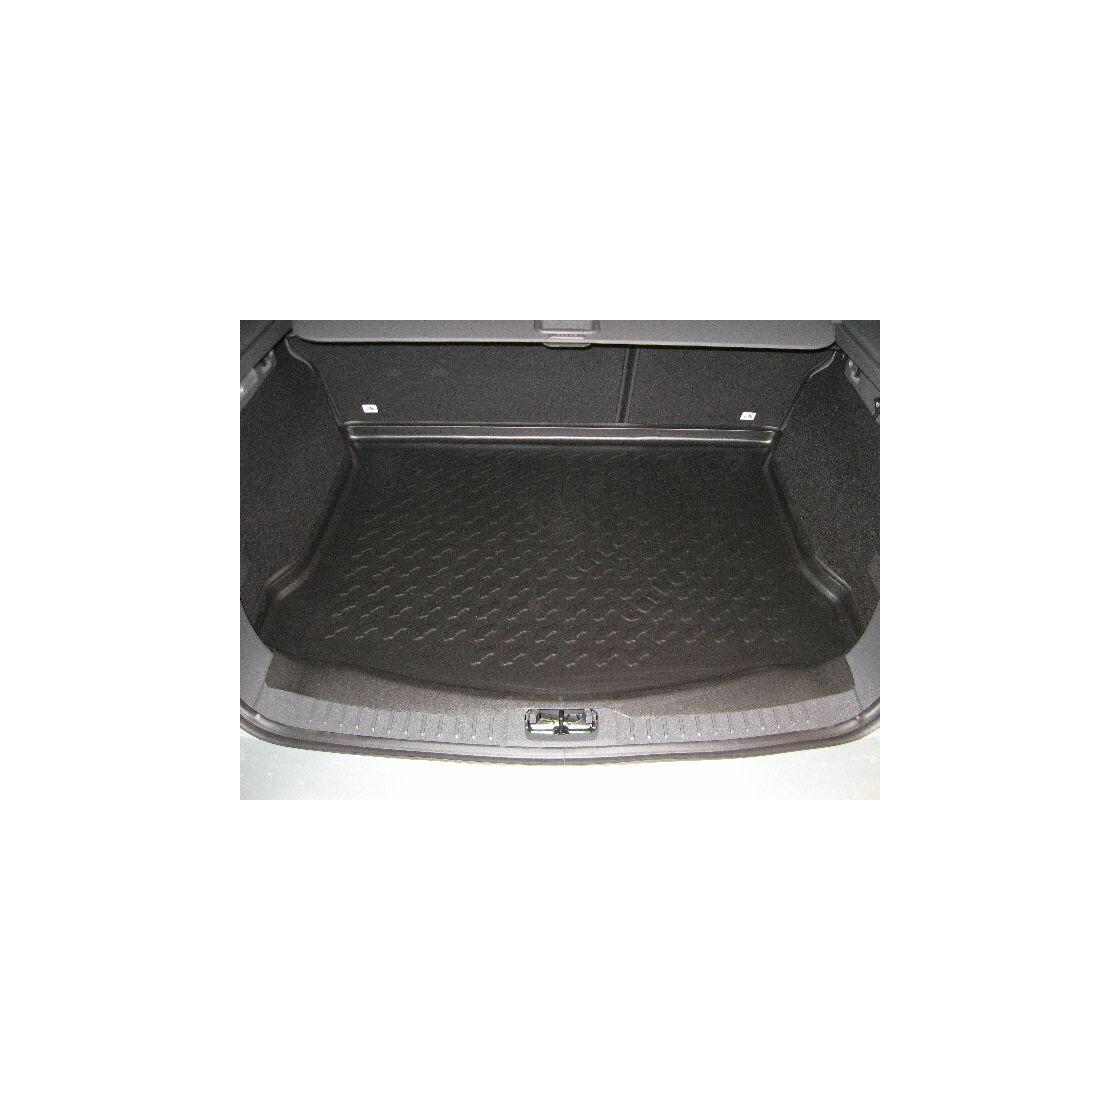 kofferraummatte ford kuga i typ dm2 gummimatte teppich schalenmatte 92 99. Black Bedroom Furniture Sets. Home Design Ideas